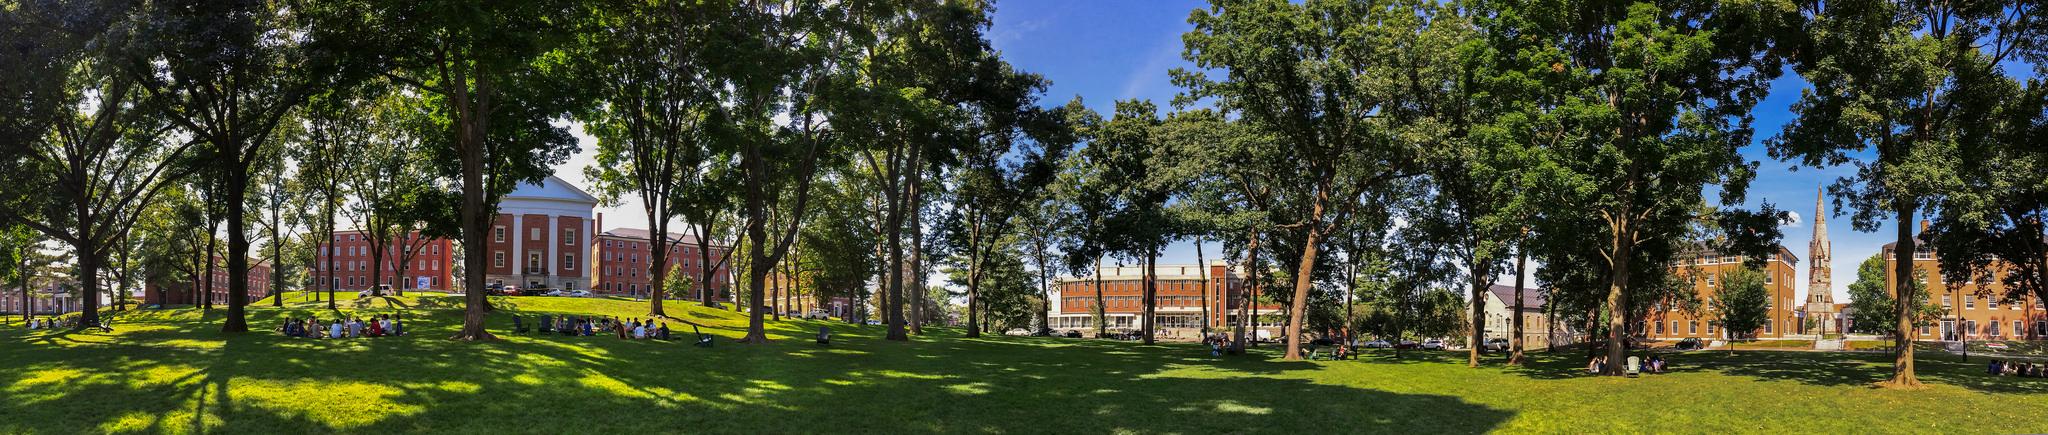 panoramic view of freshman quad